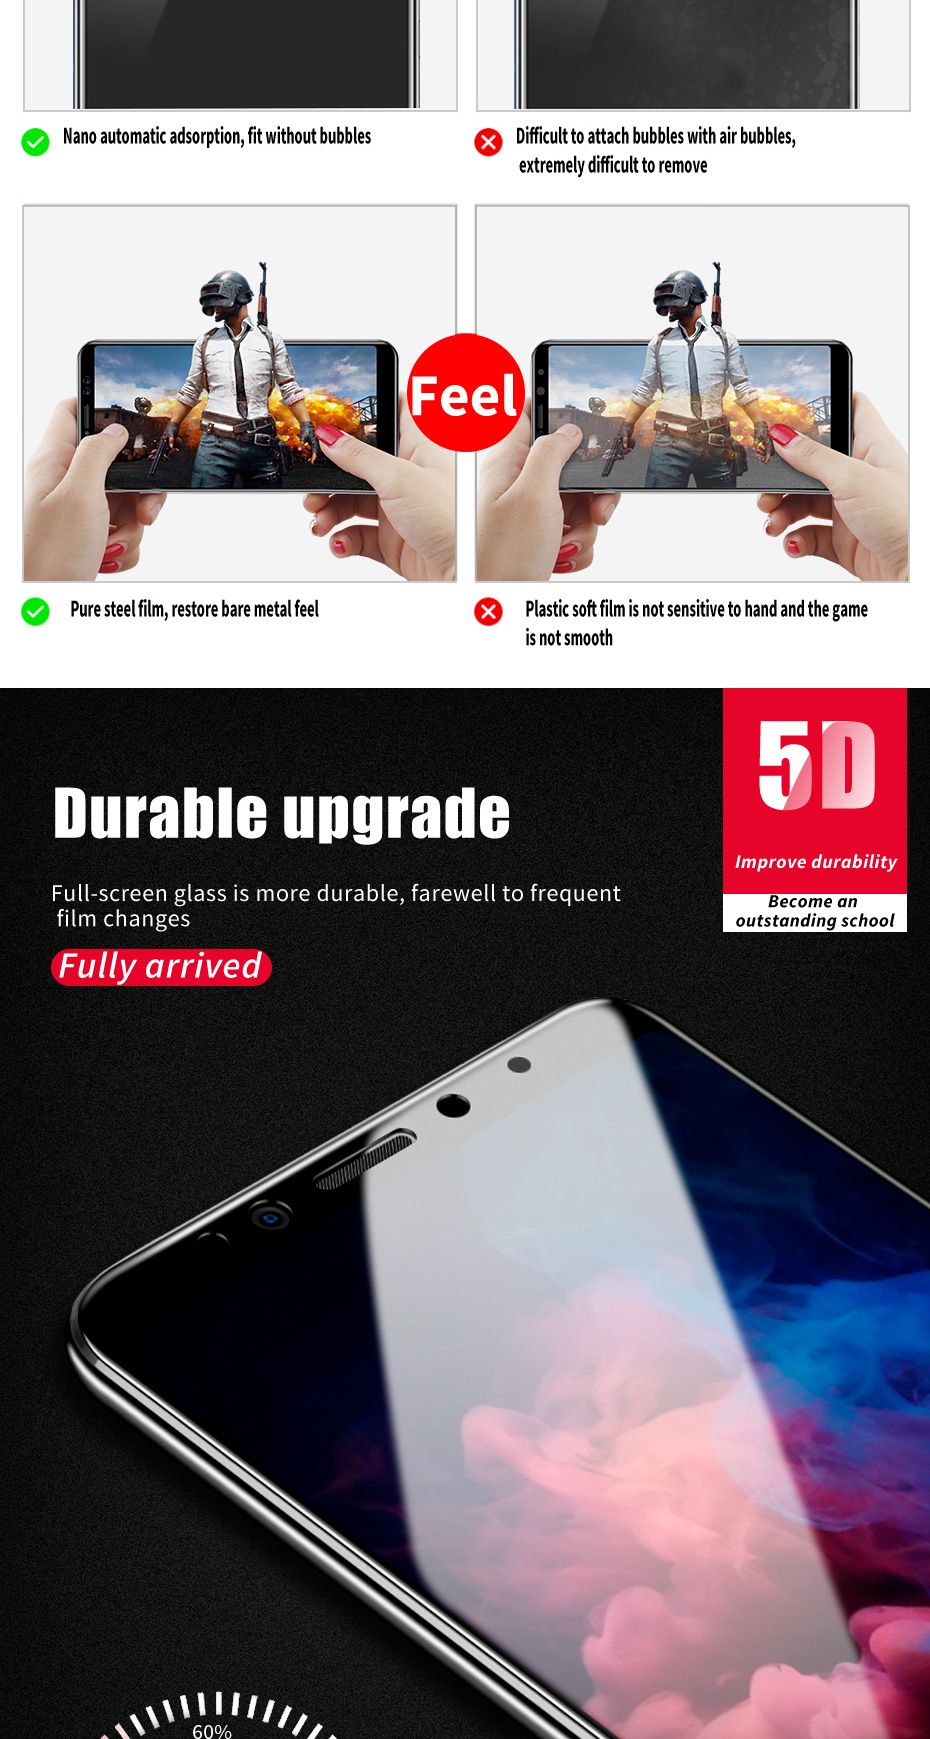 ZNP 5D Screen Protector Tempered Glass For Xiaomi Redmi Note 7 5 Pro Redmi 4X 7A 7 6 Protective Glass For Redmi 5 Plus k20 Film 8